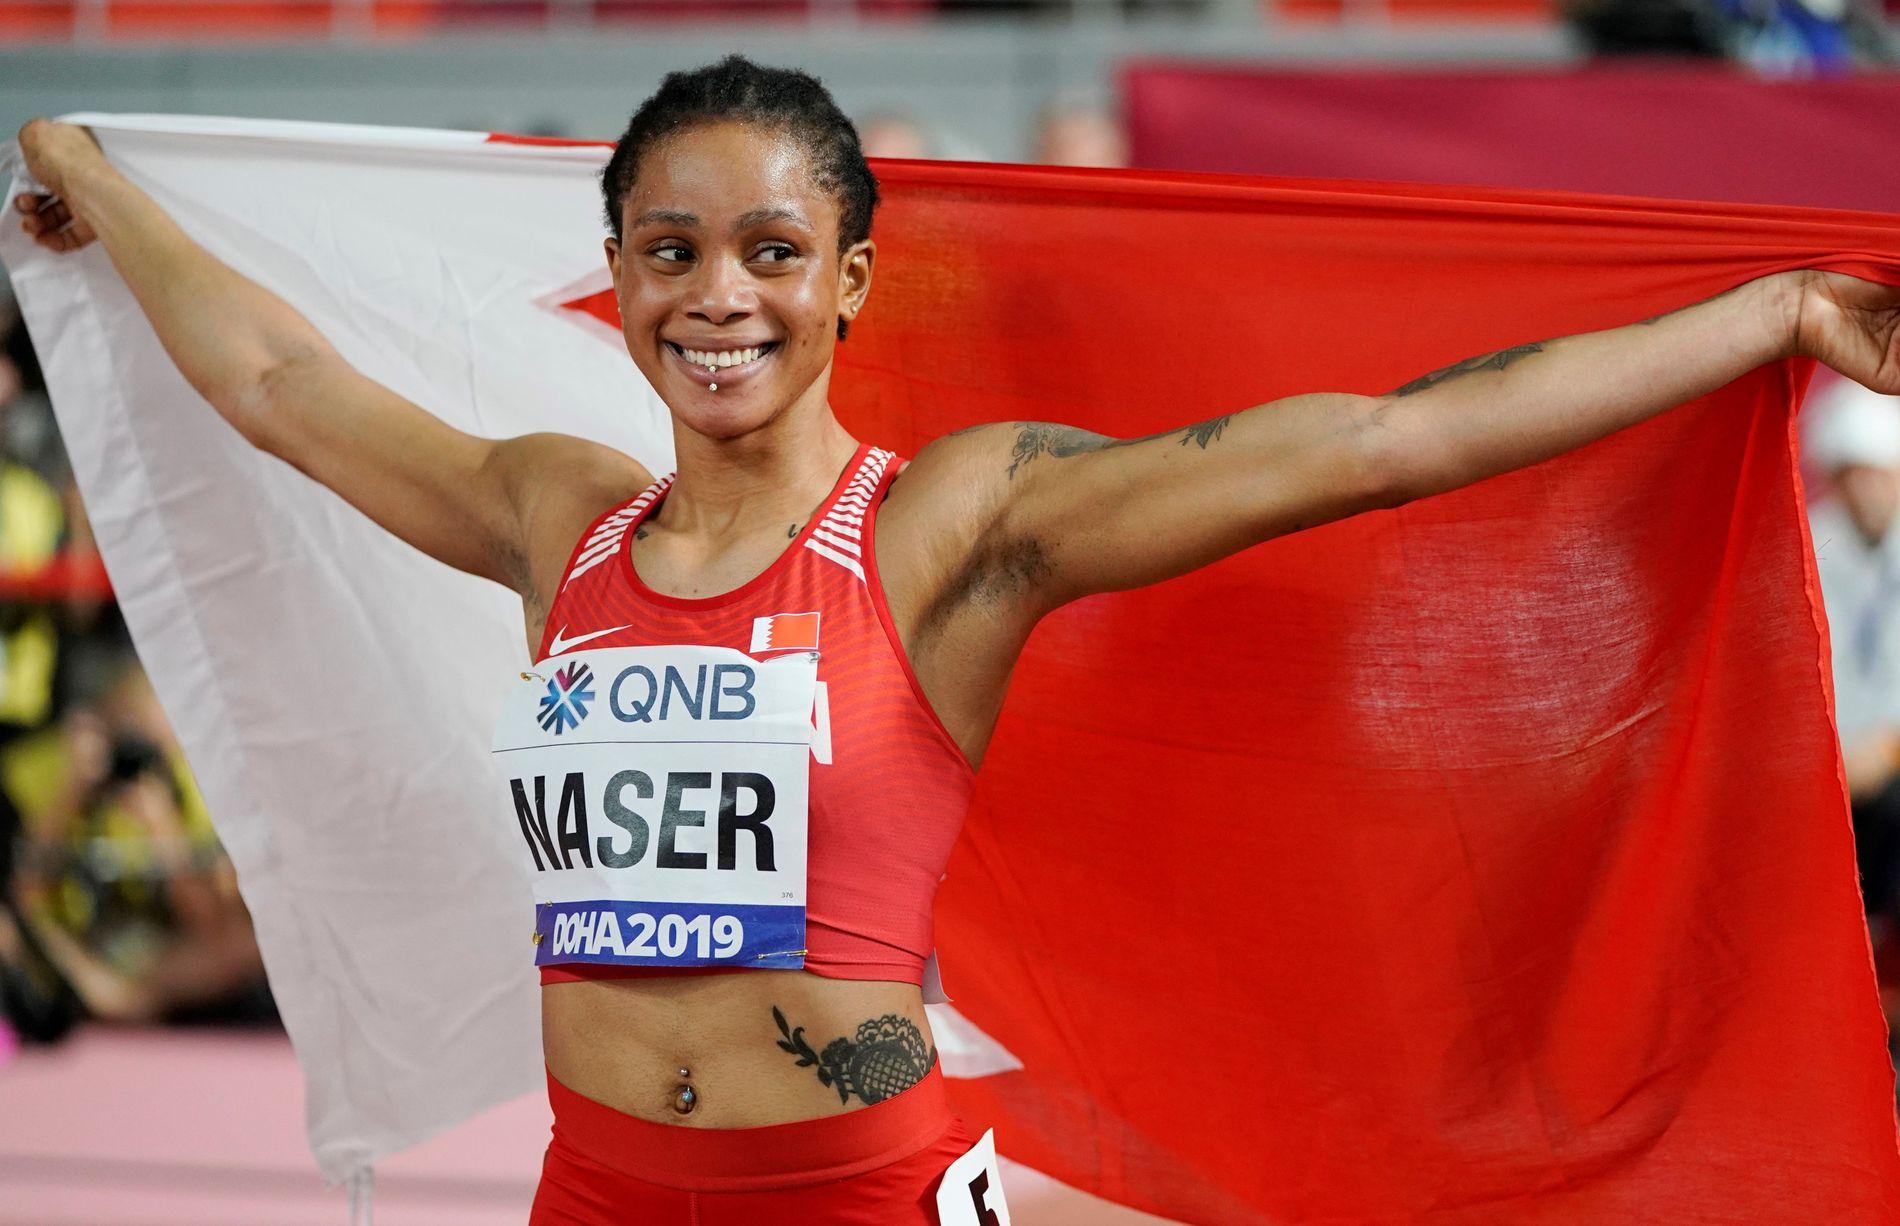 Salwa Eid Naser, world 400m champion, cleared in drug